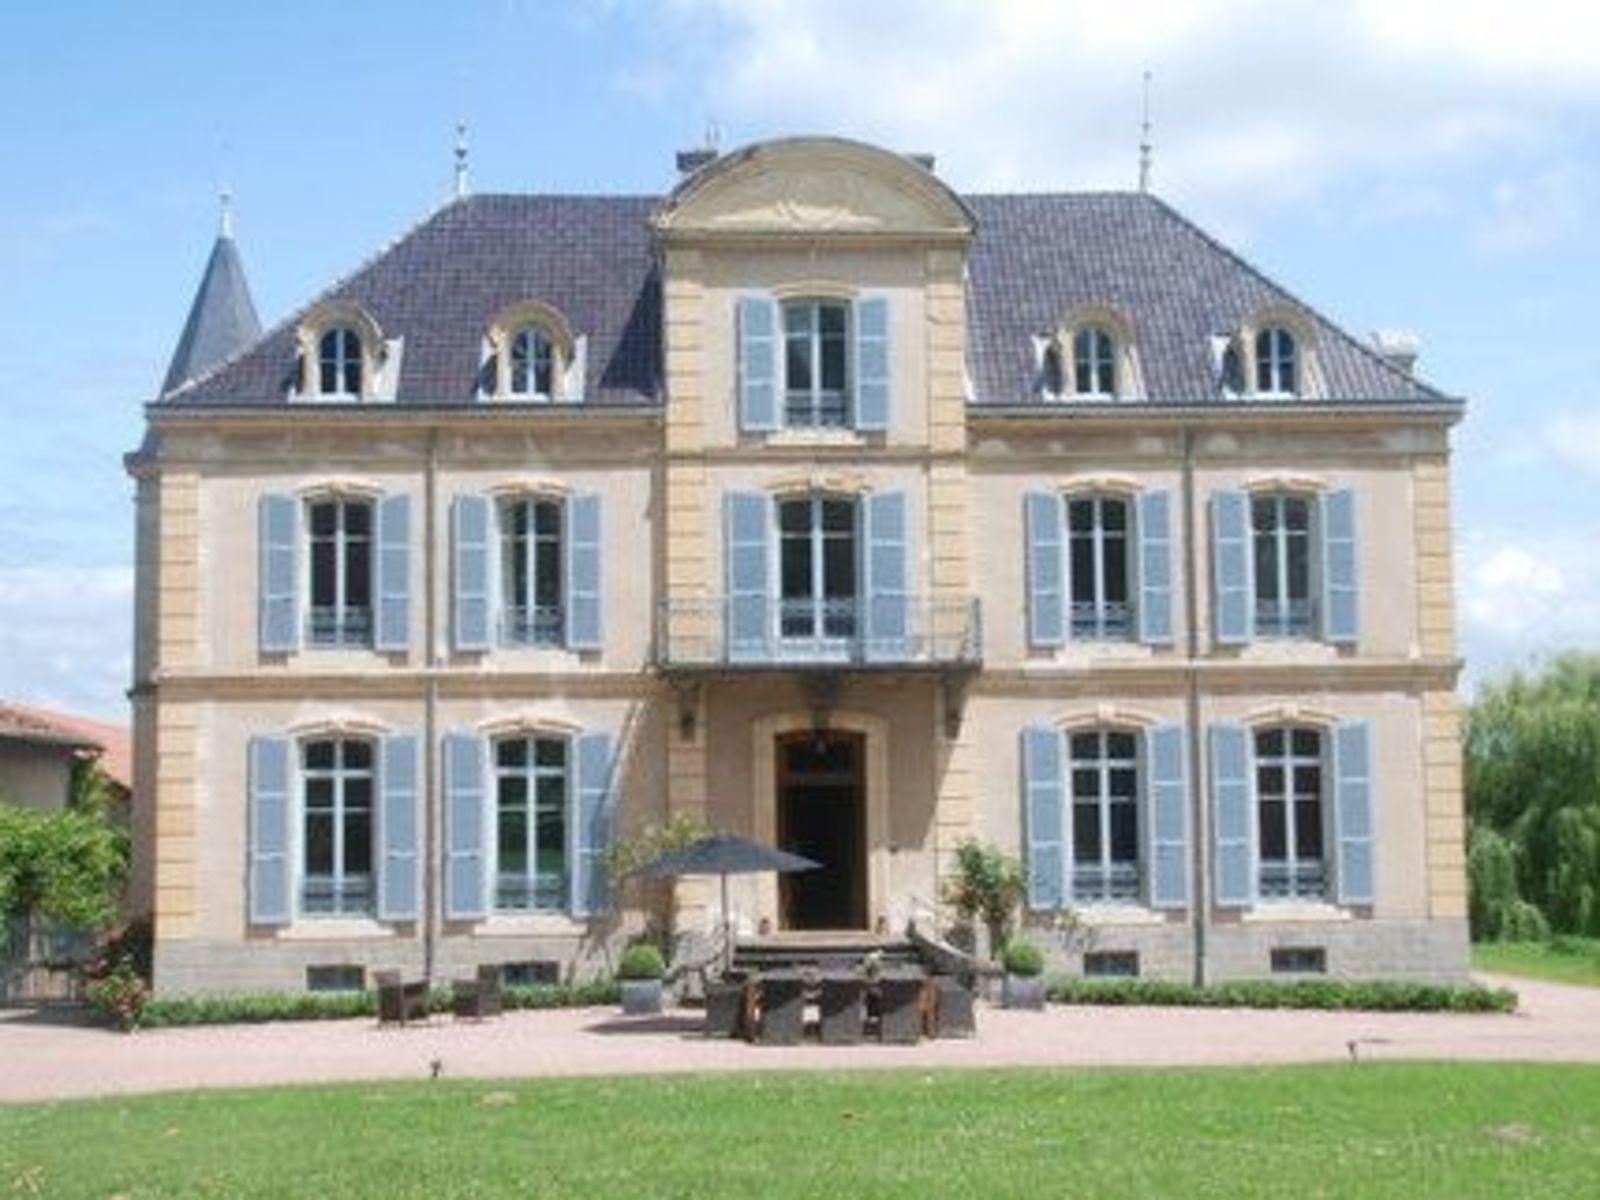 Domaine du Roi François - Château - kasteelvakantie Frankrijk